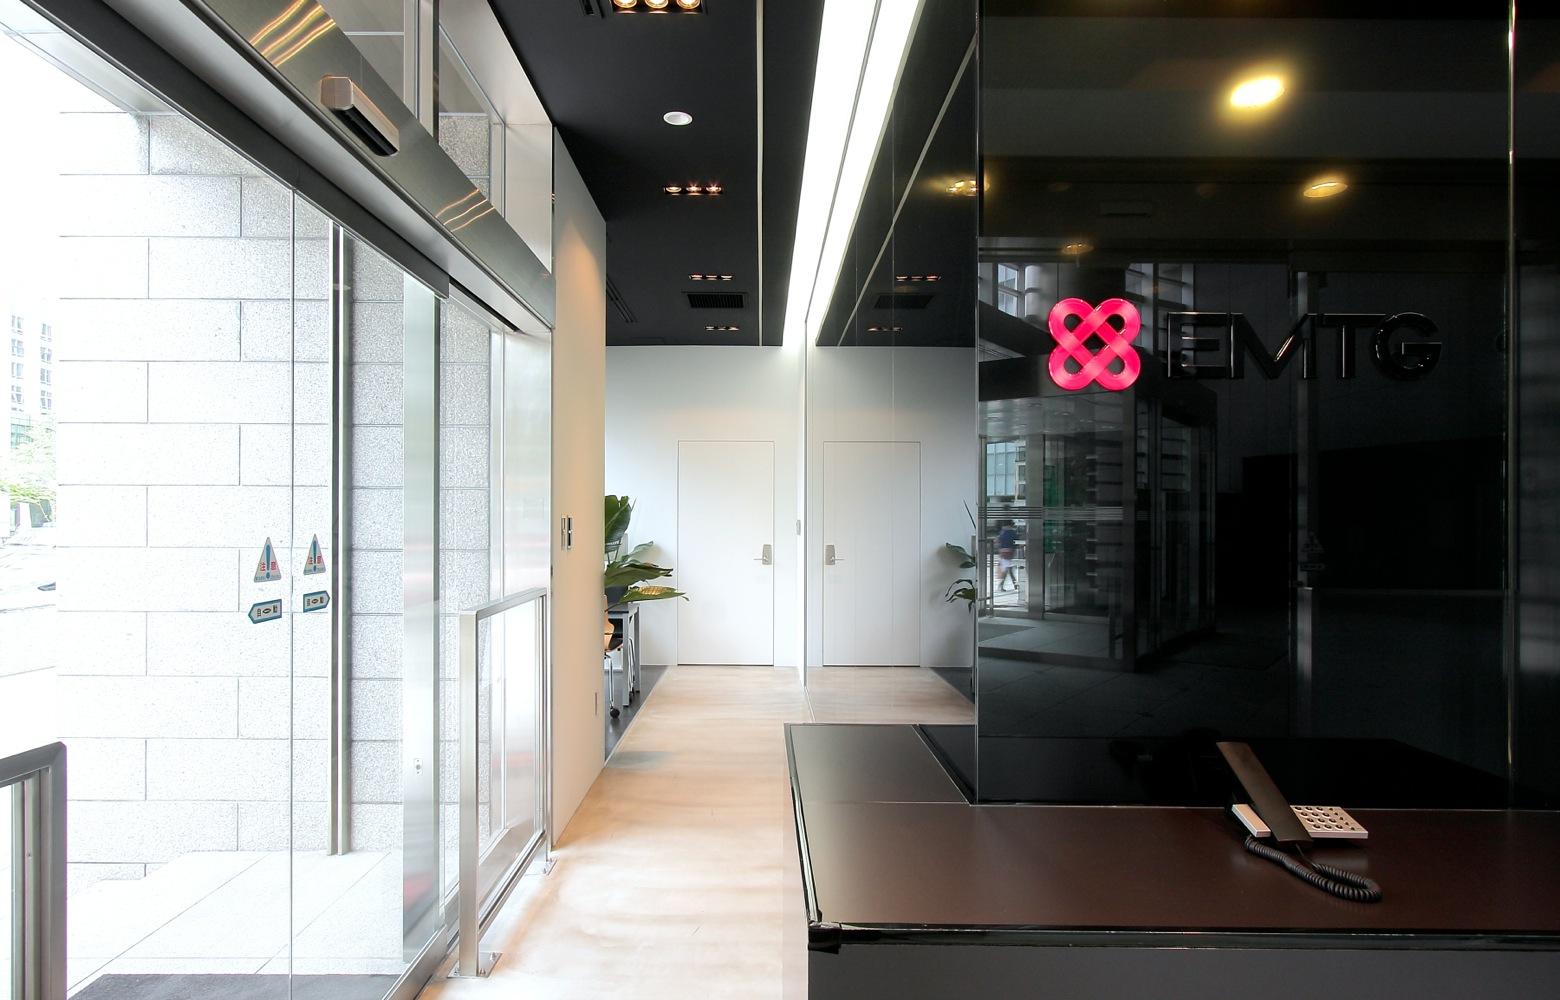 EMTG株式会社 Entrance_2 デザイン・レイアウト事例